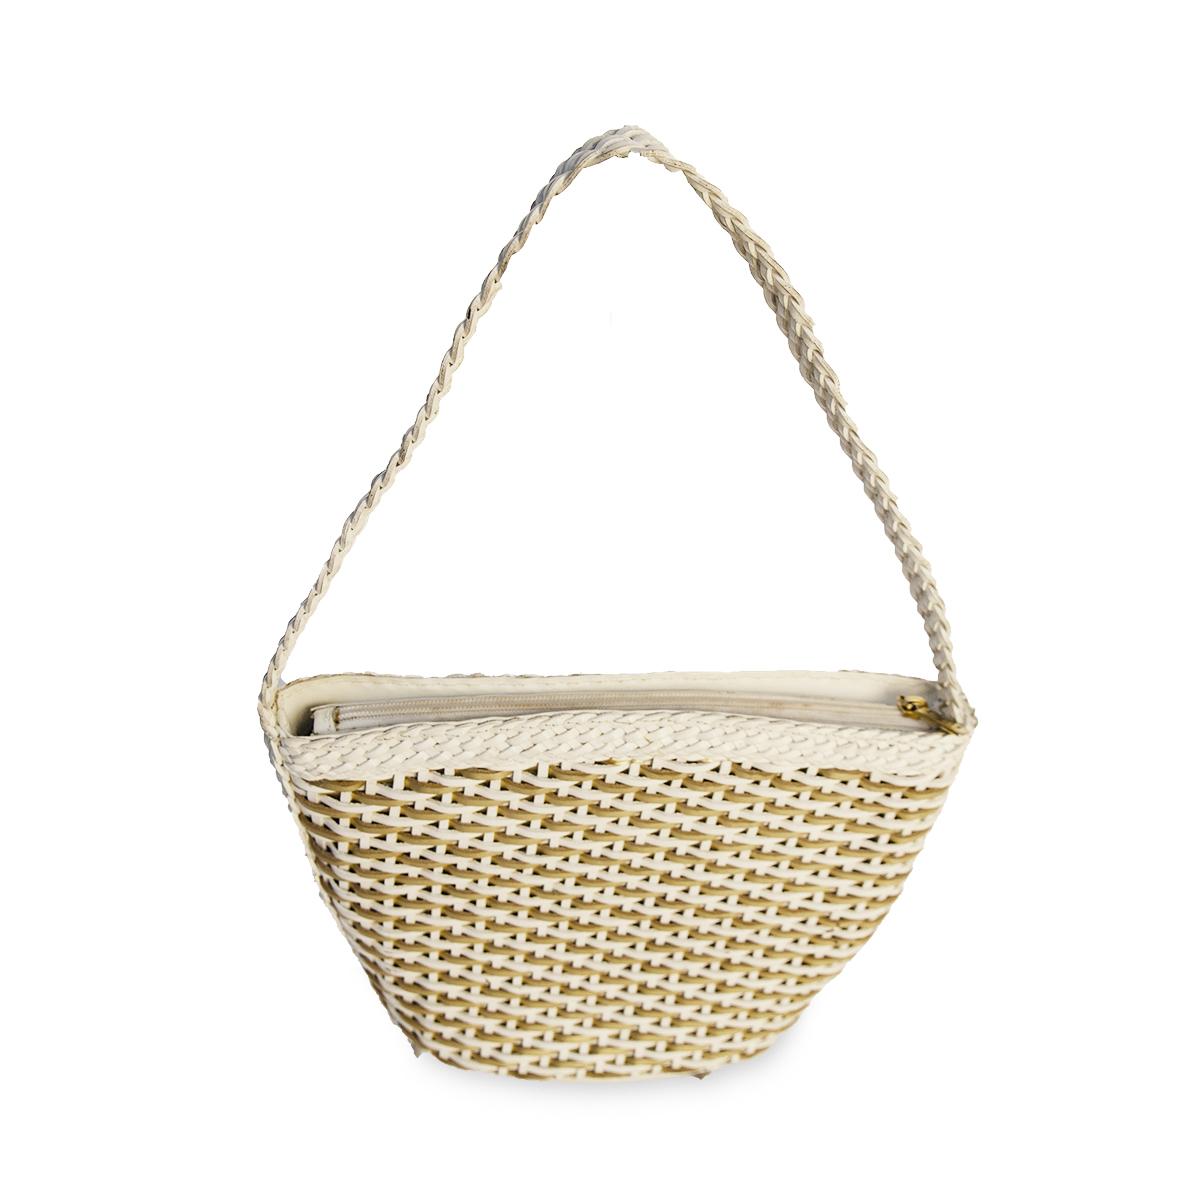 Vintage bucket bag